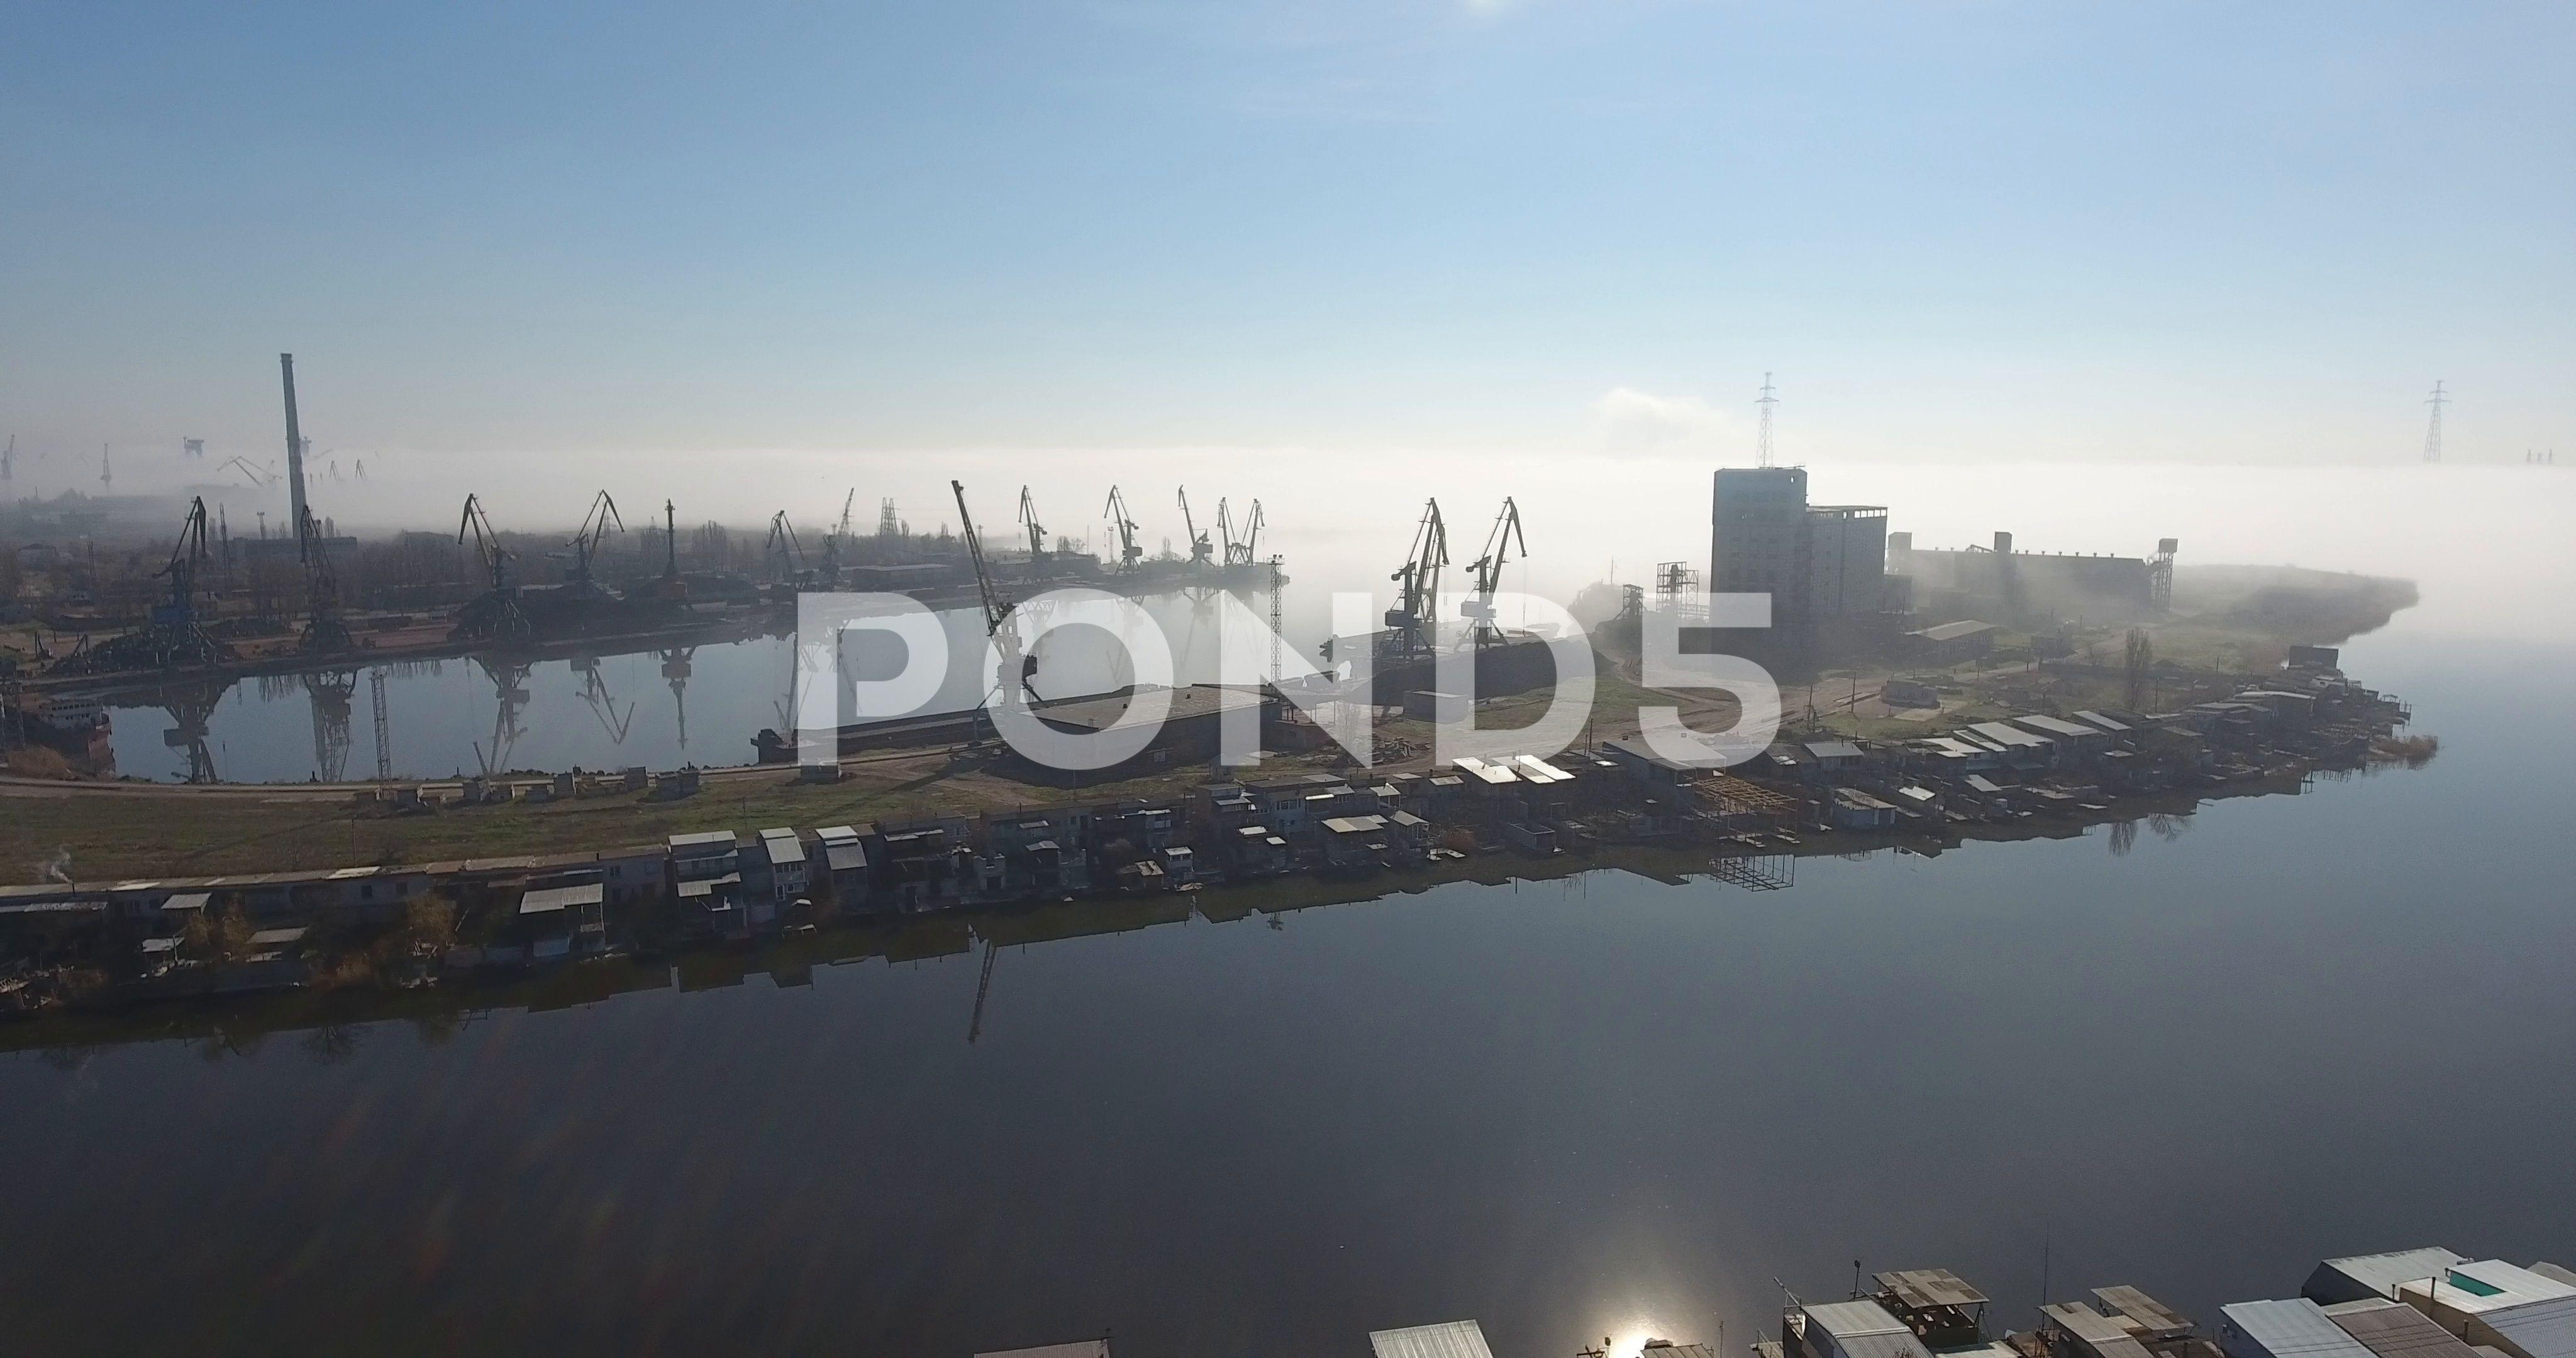 Fantastic city in the fog 86